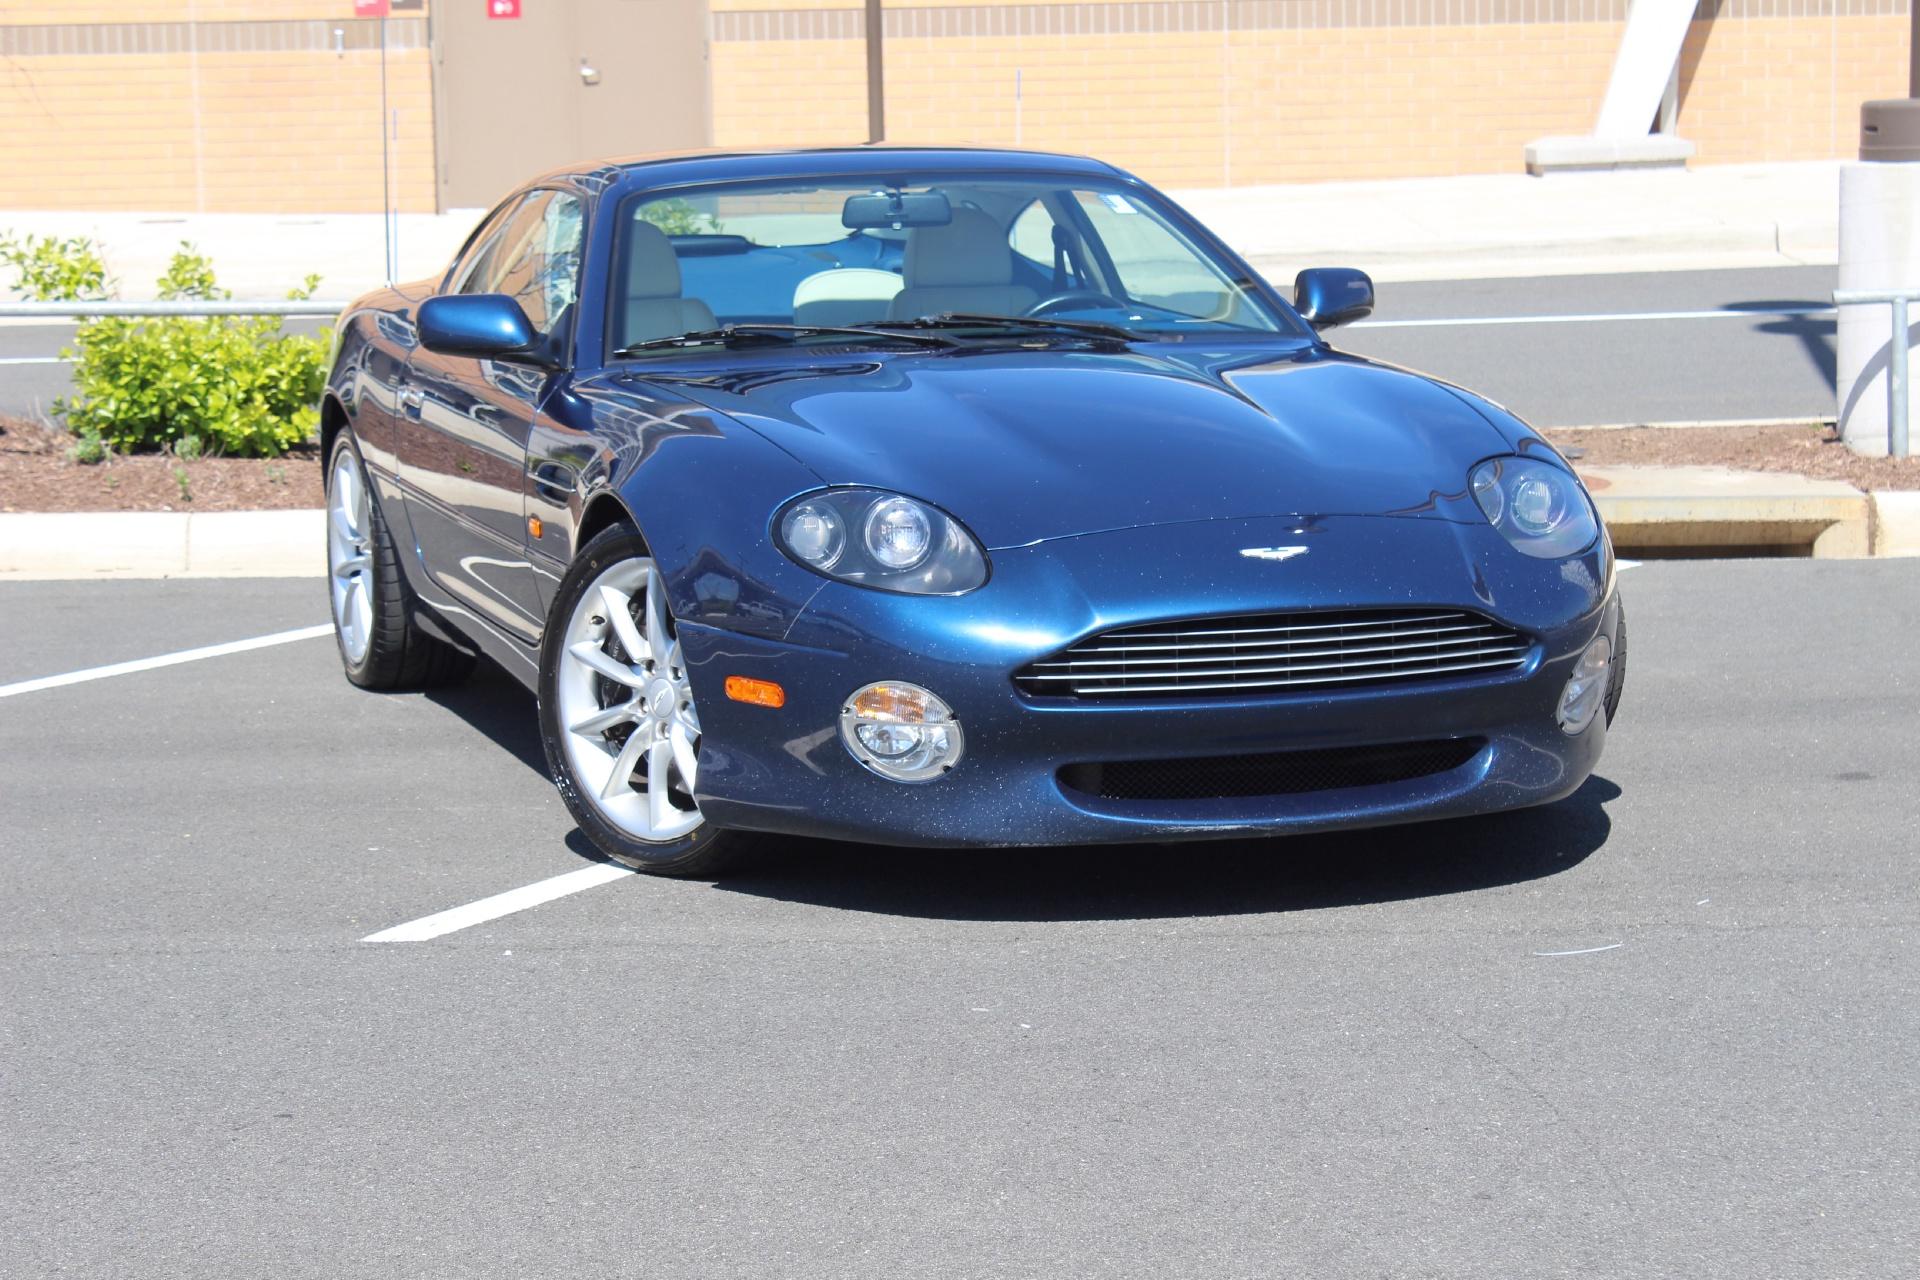 Used-2002-Aston-Martin-DB7-Vantage-Vanta